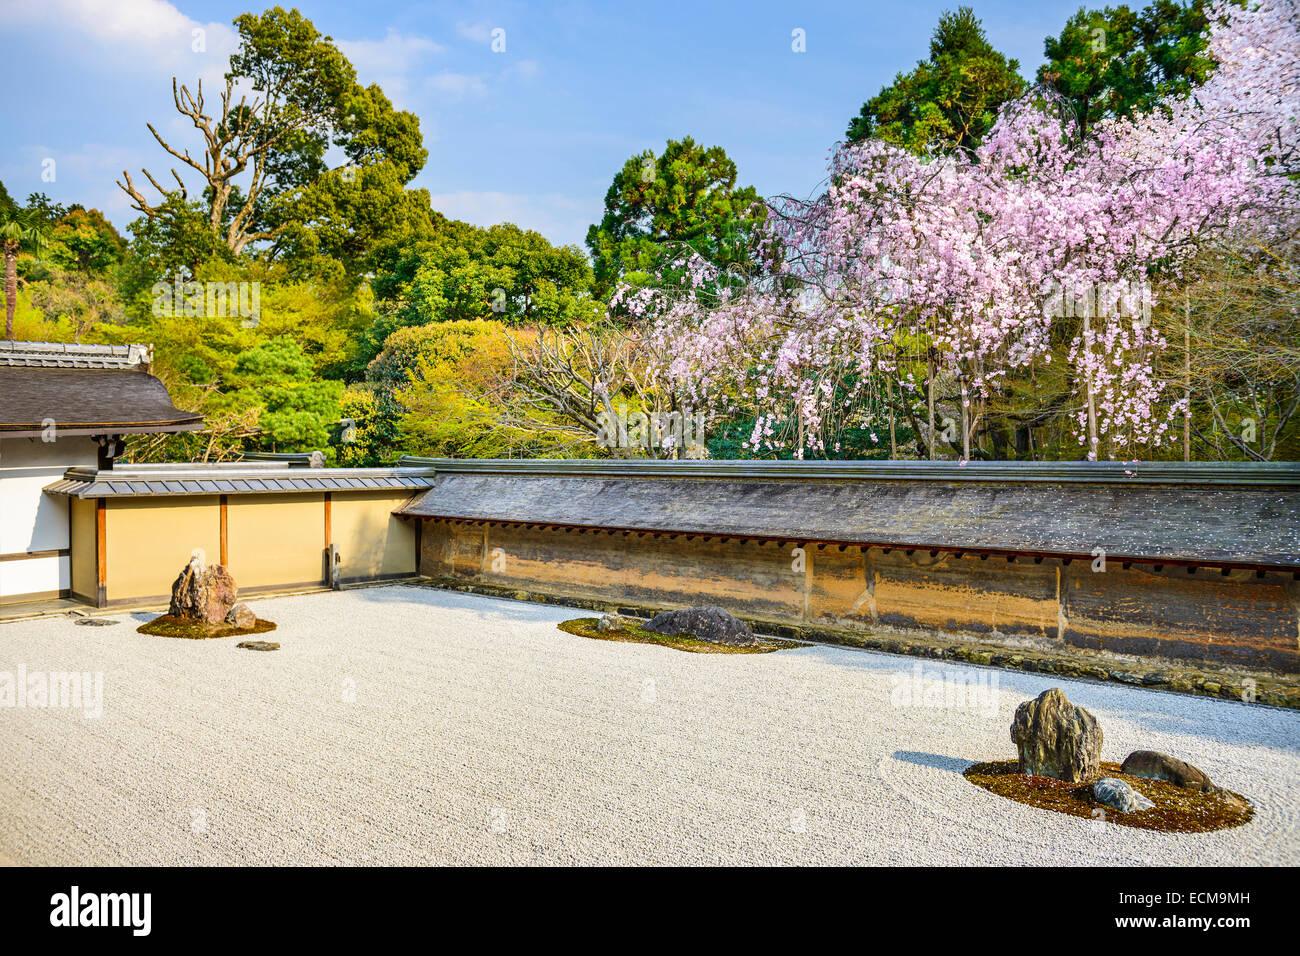 Kyoto Japan Im Ryōan Ji Tempel Zen Garten In Der Fruhjahrssaison